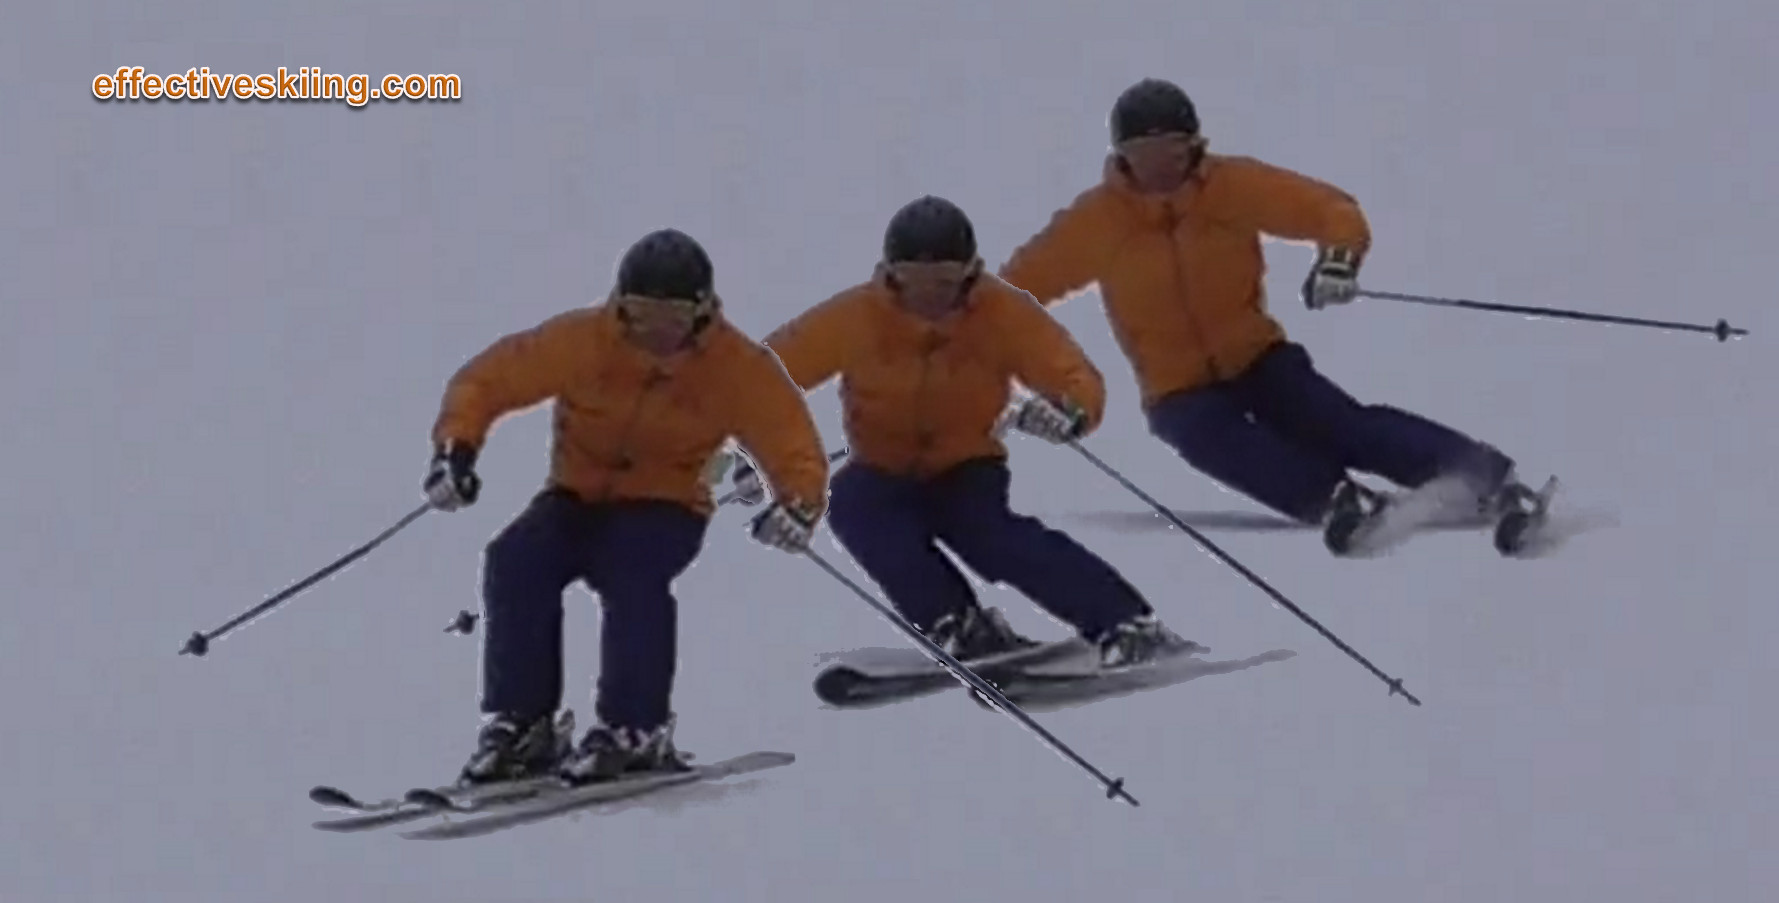 More edge angle make for dynamic skiing